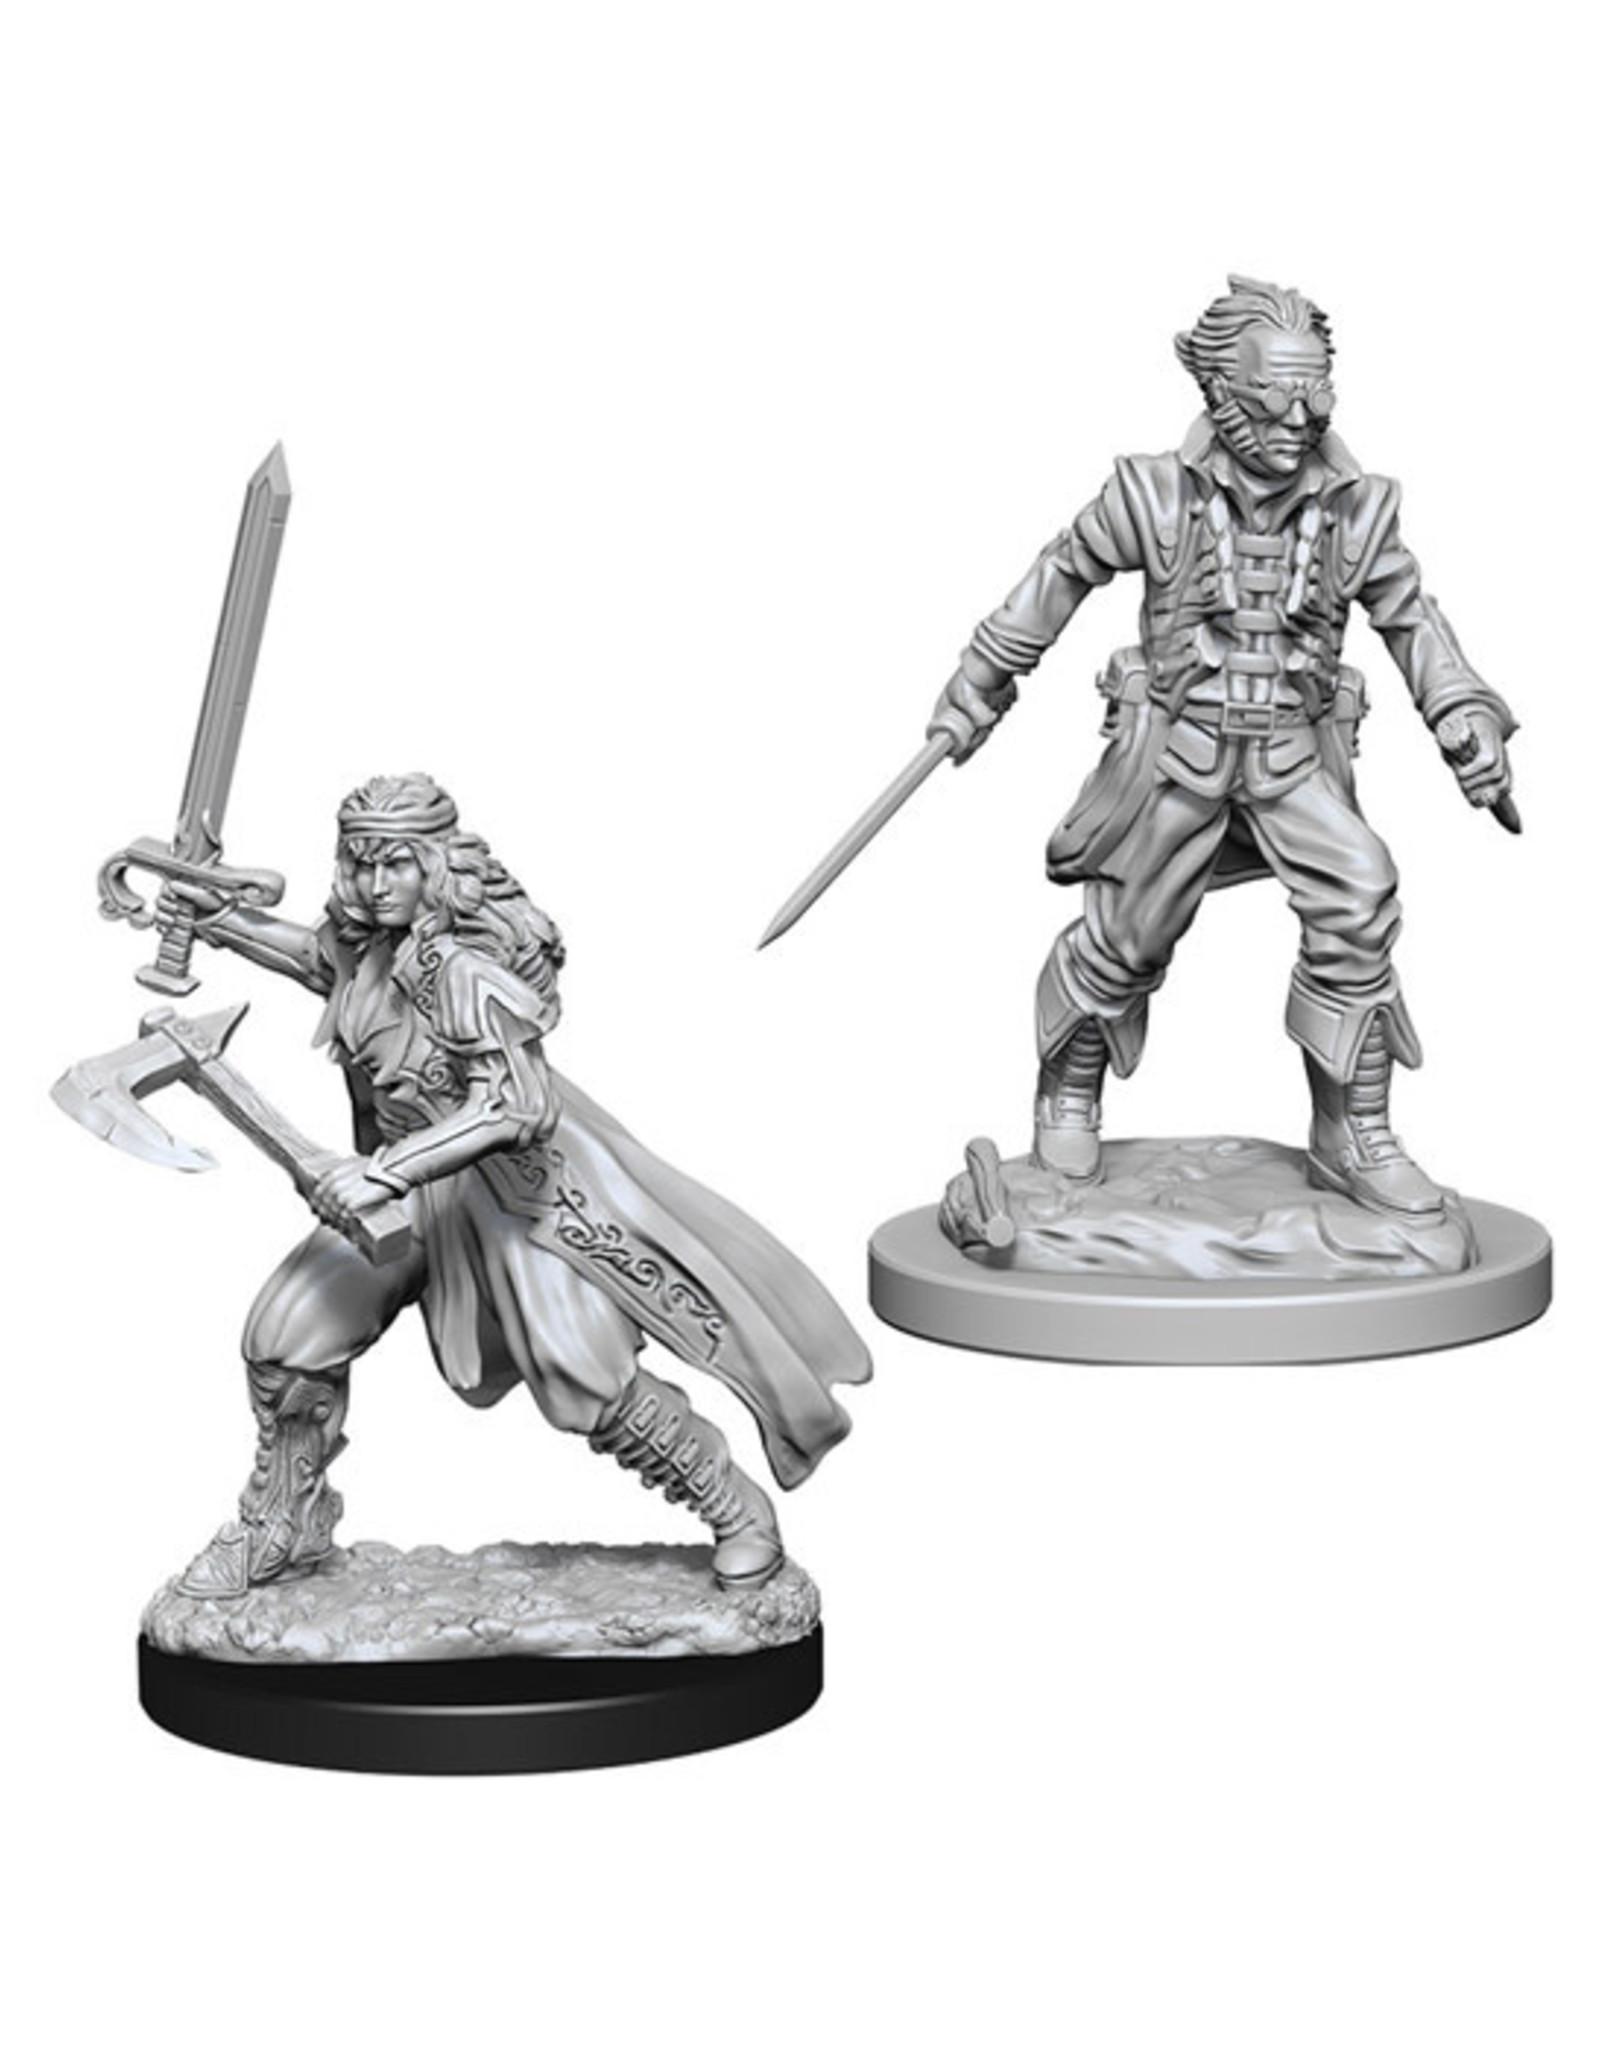 Dungeons & Dragons Dungeons & Dragons: Nolzur's - Vampire Hunters